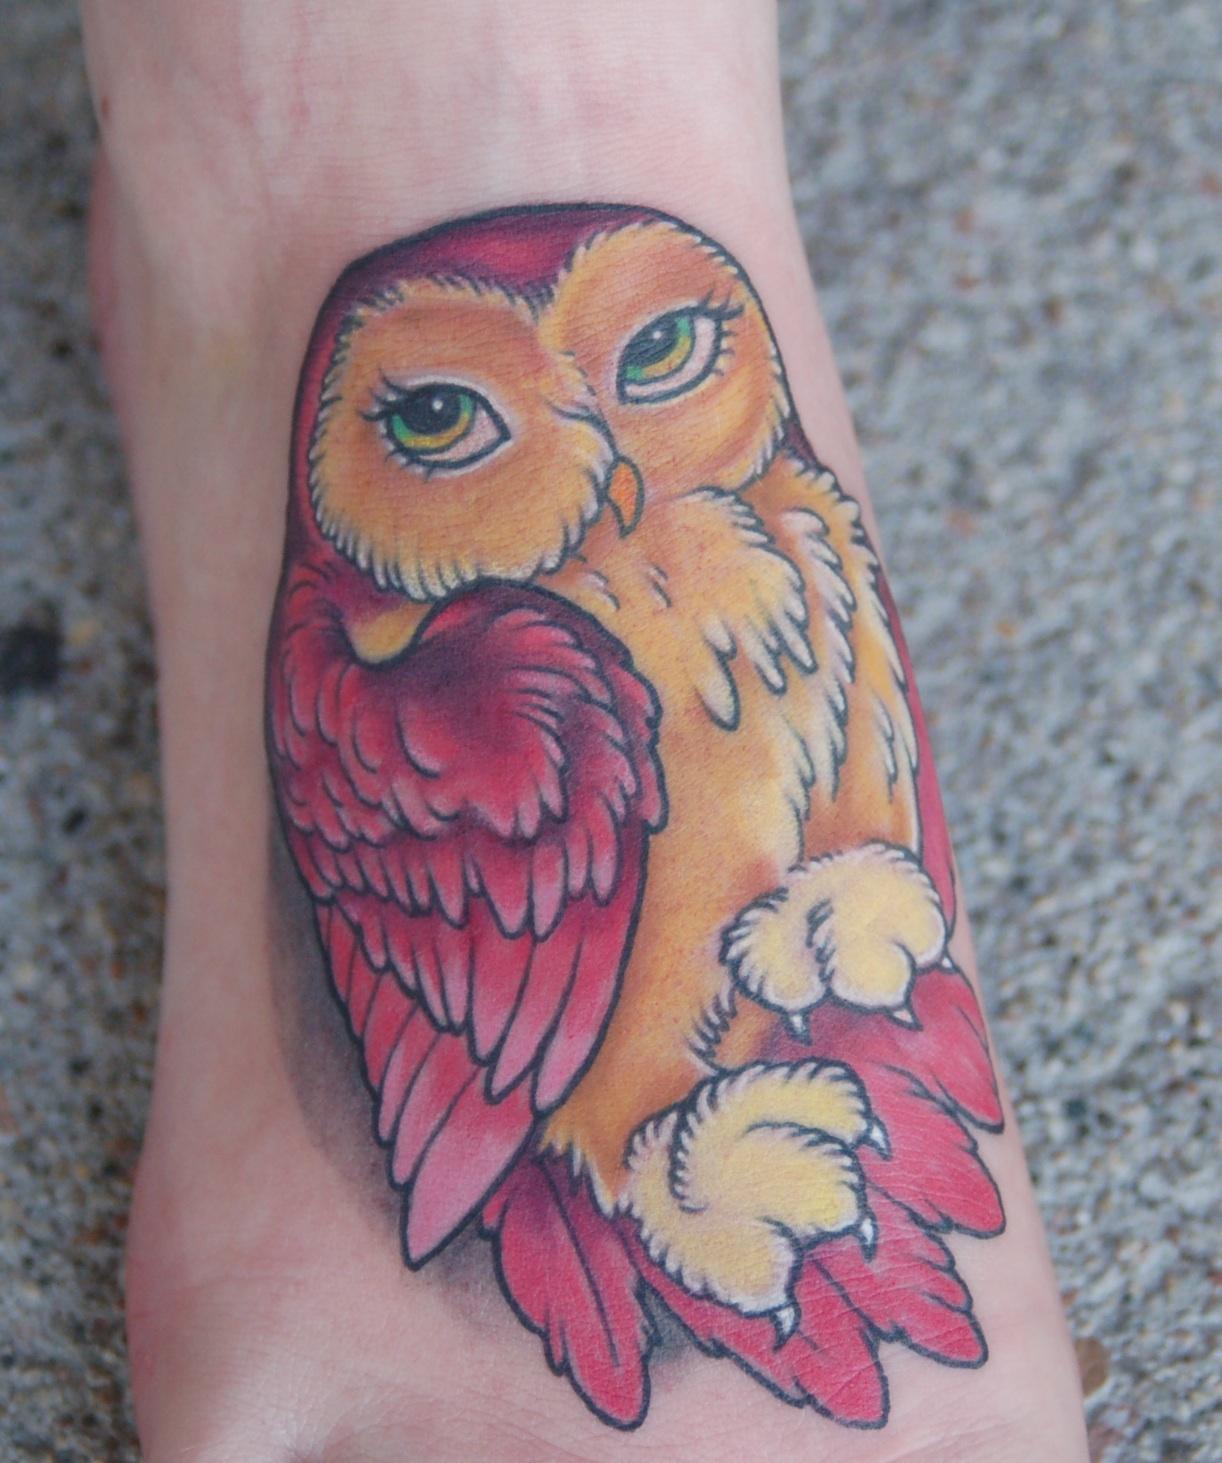 http://1.bp.blogspot.com/-PAXplyTCwDU/TfRGBb0FgFI/AAAAAAAAC24/8HmTX9apCWo/s1600/pink_owl_tattoo.jpg